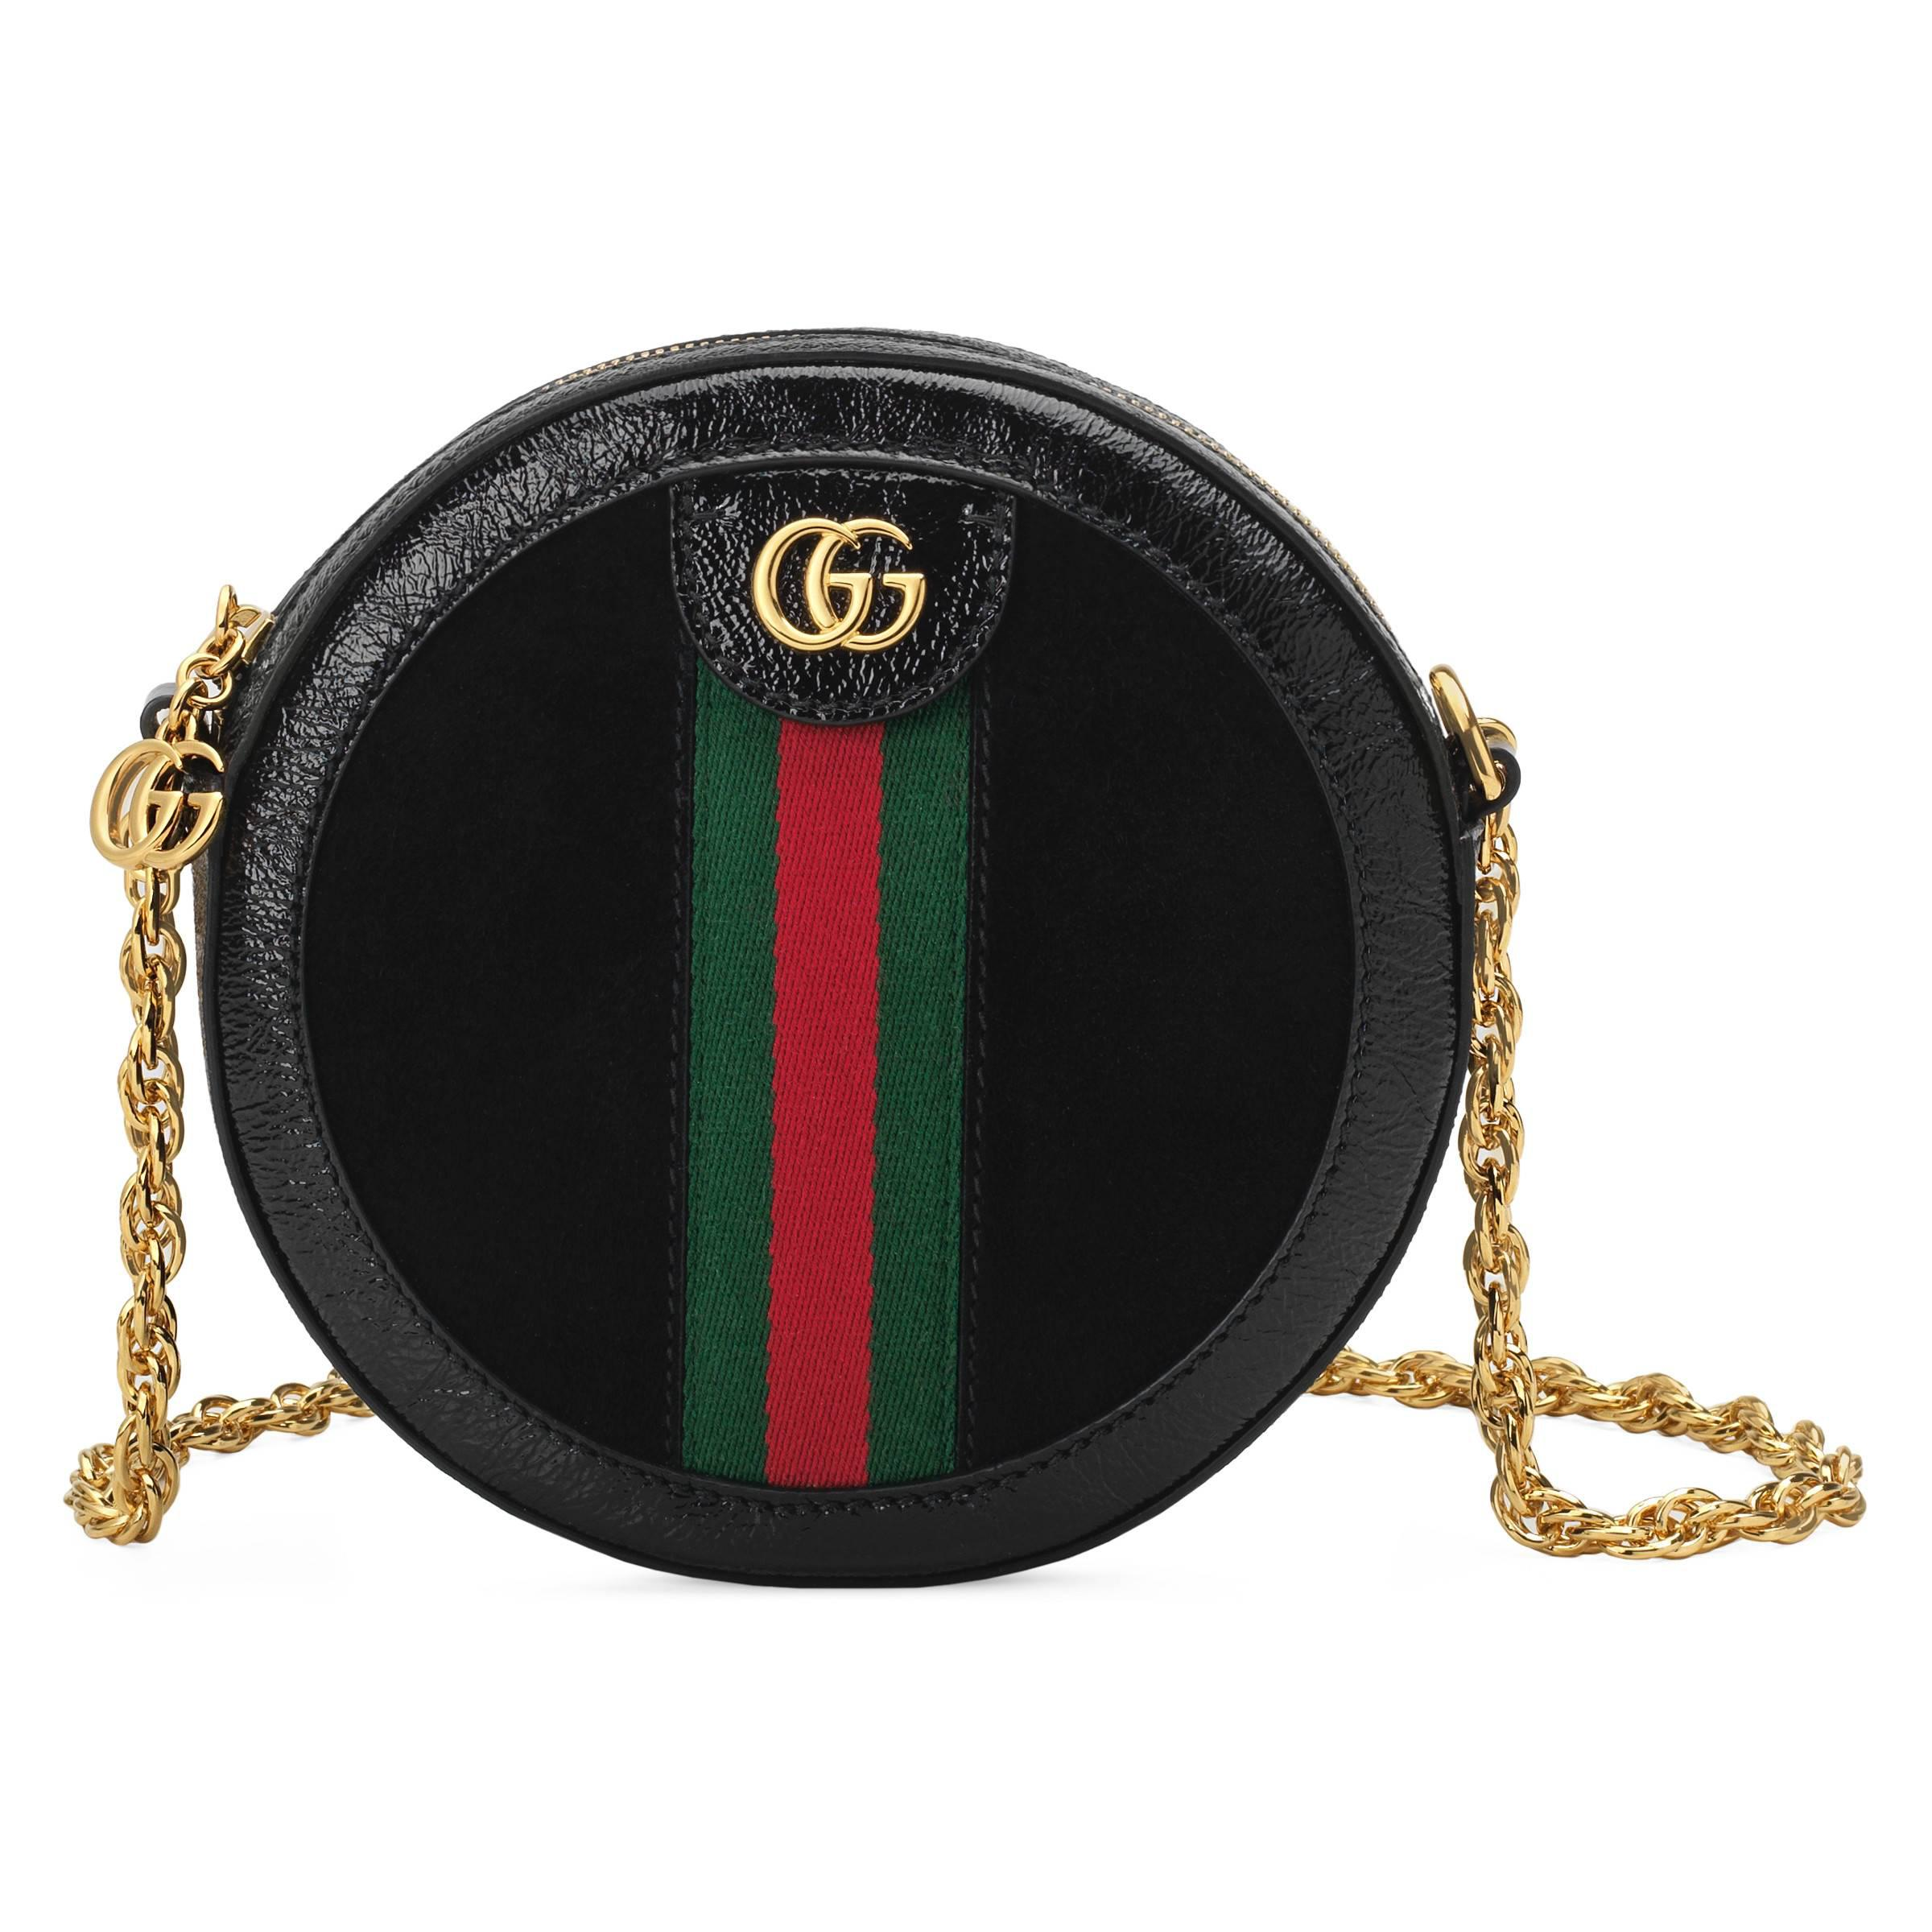 15f87a7a Gucci Ophidia Crossbody Bag in Black - Save 39% - Lyst